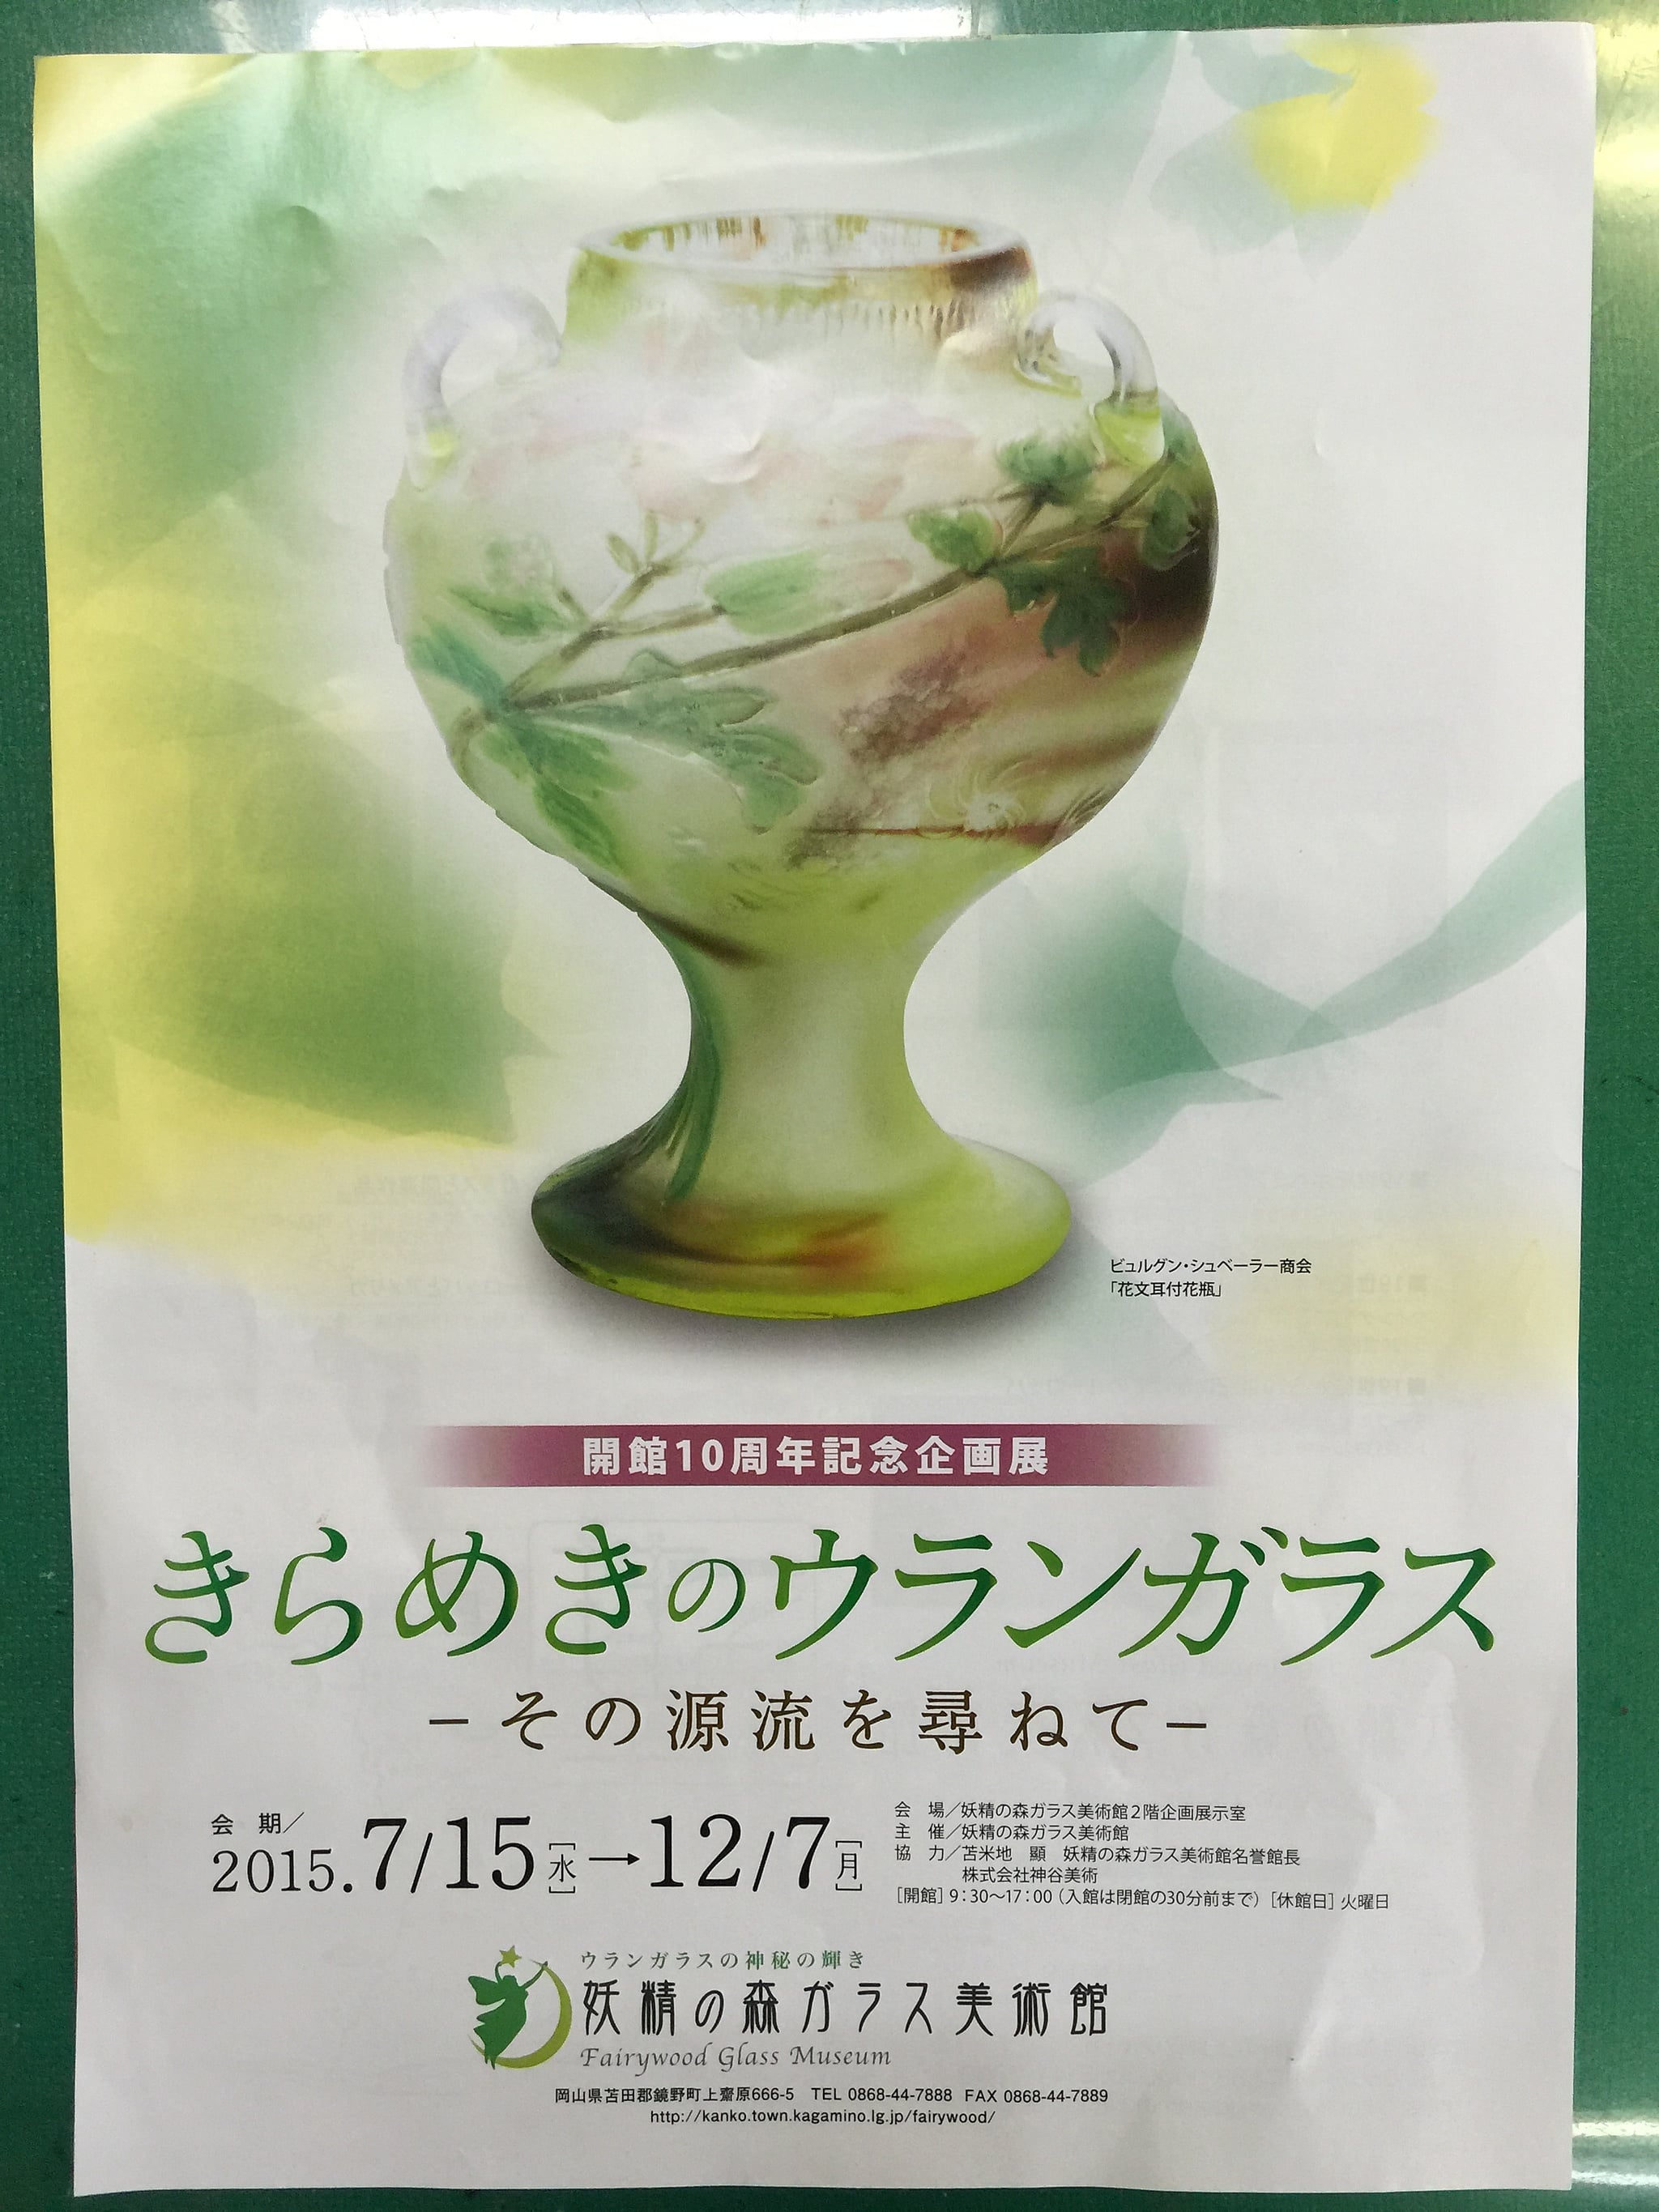 https://ogura-sekkei.jp/files/libs/17/2015110916344627.JPG